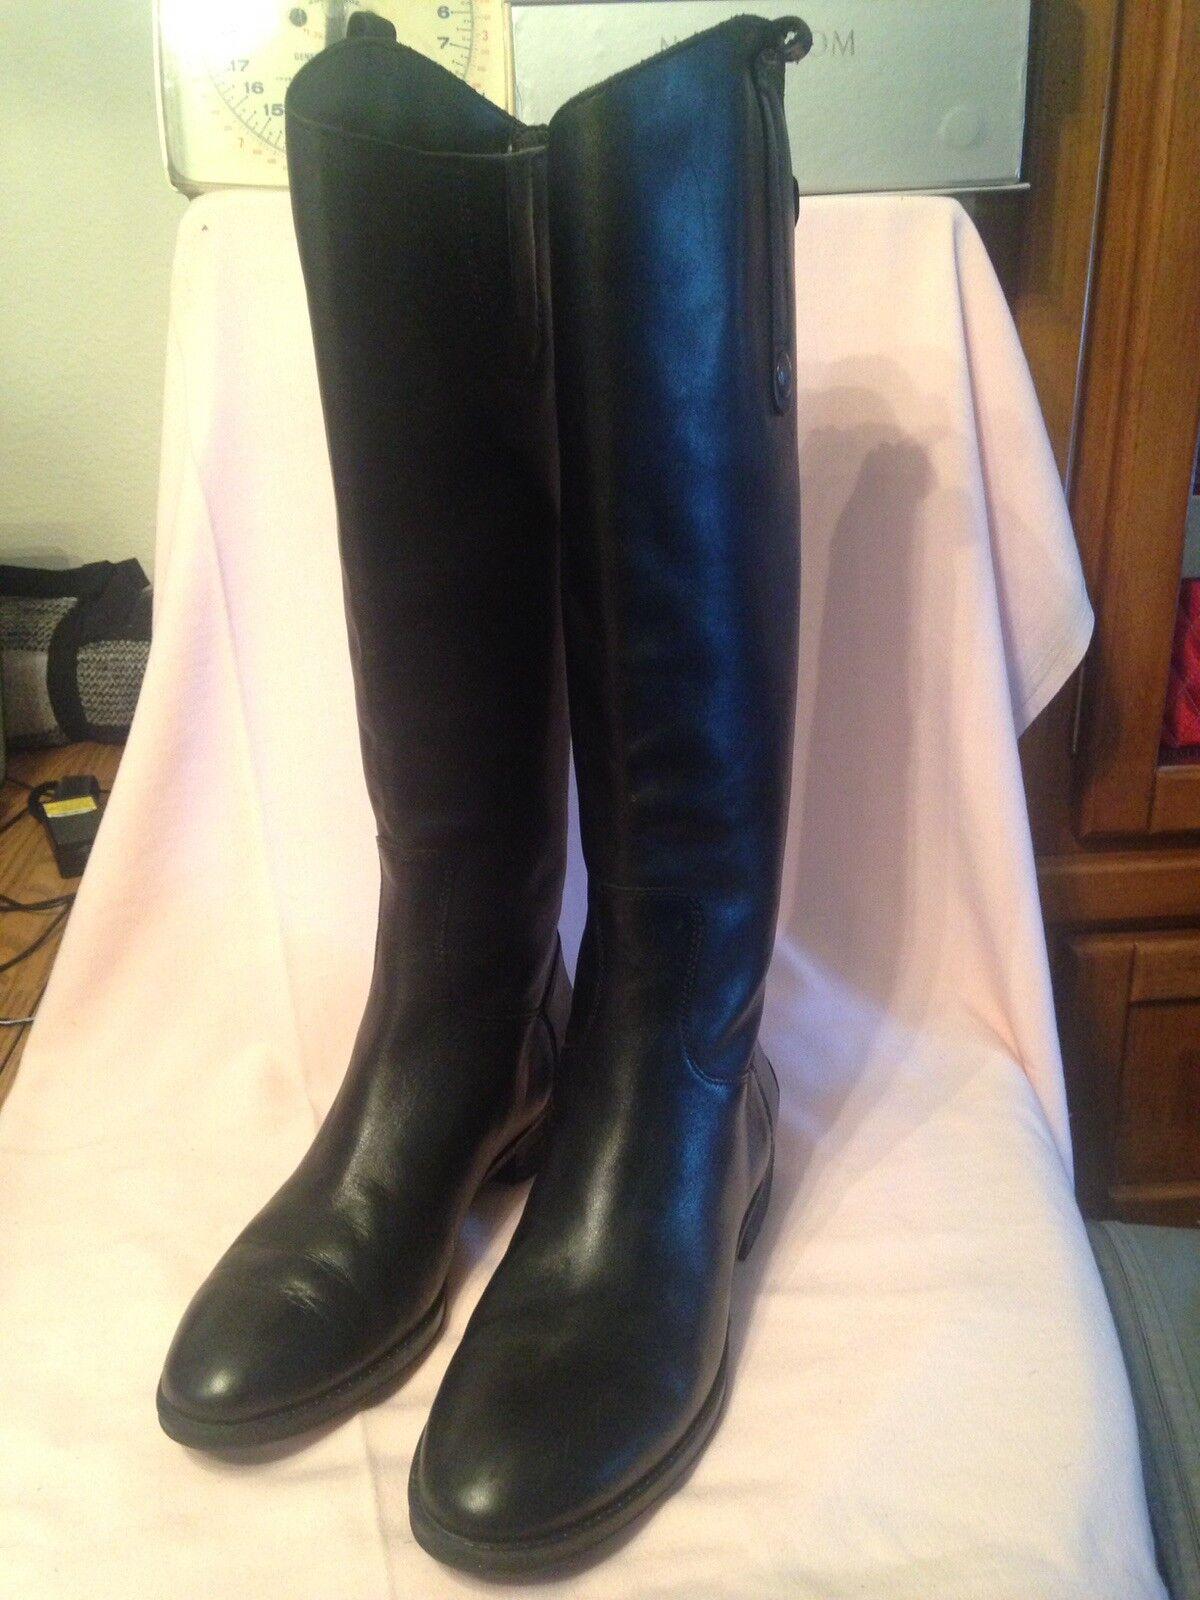 Sam Edelman Edelman Edelman Nice Riding Boots In Black 7.5 aa0c3c